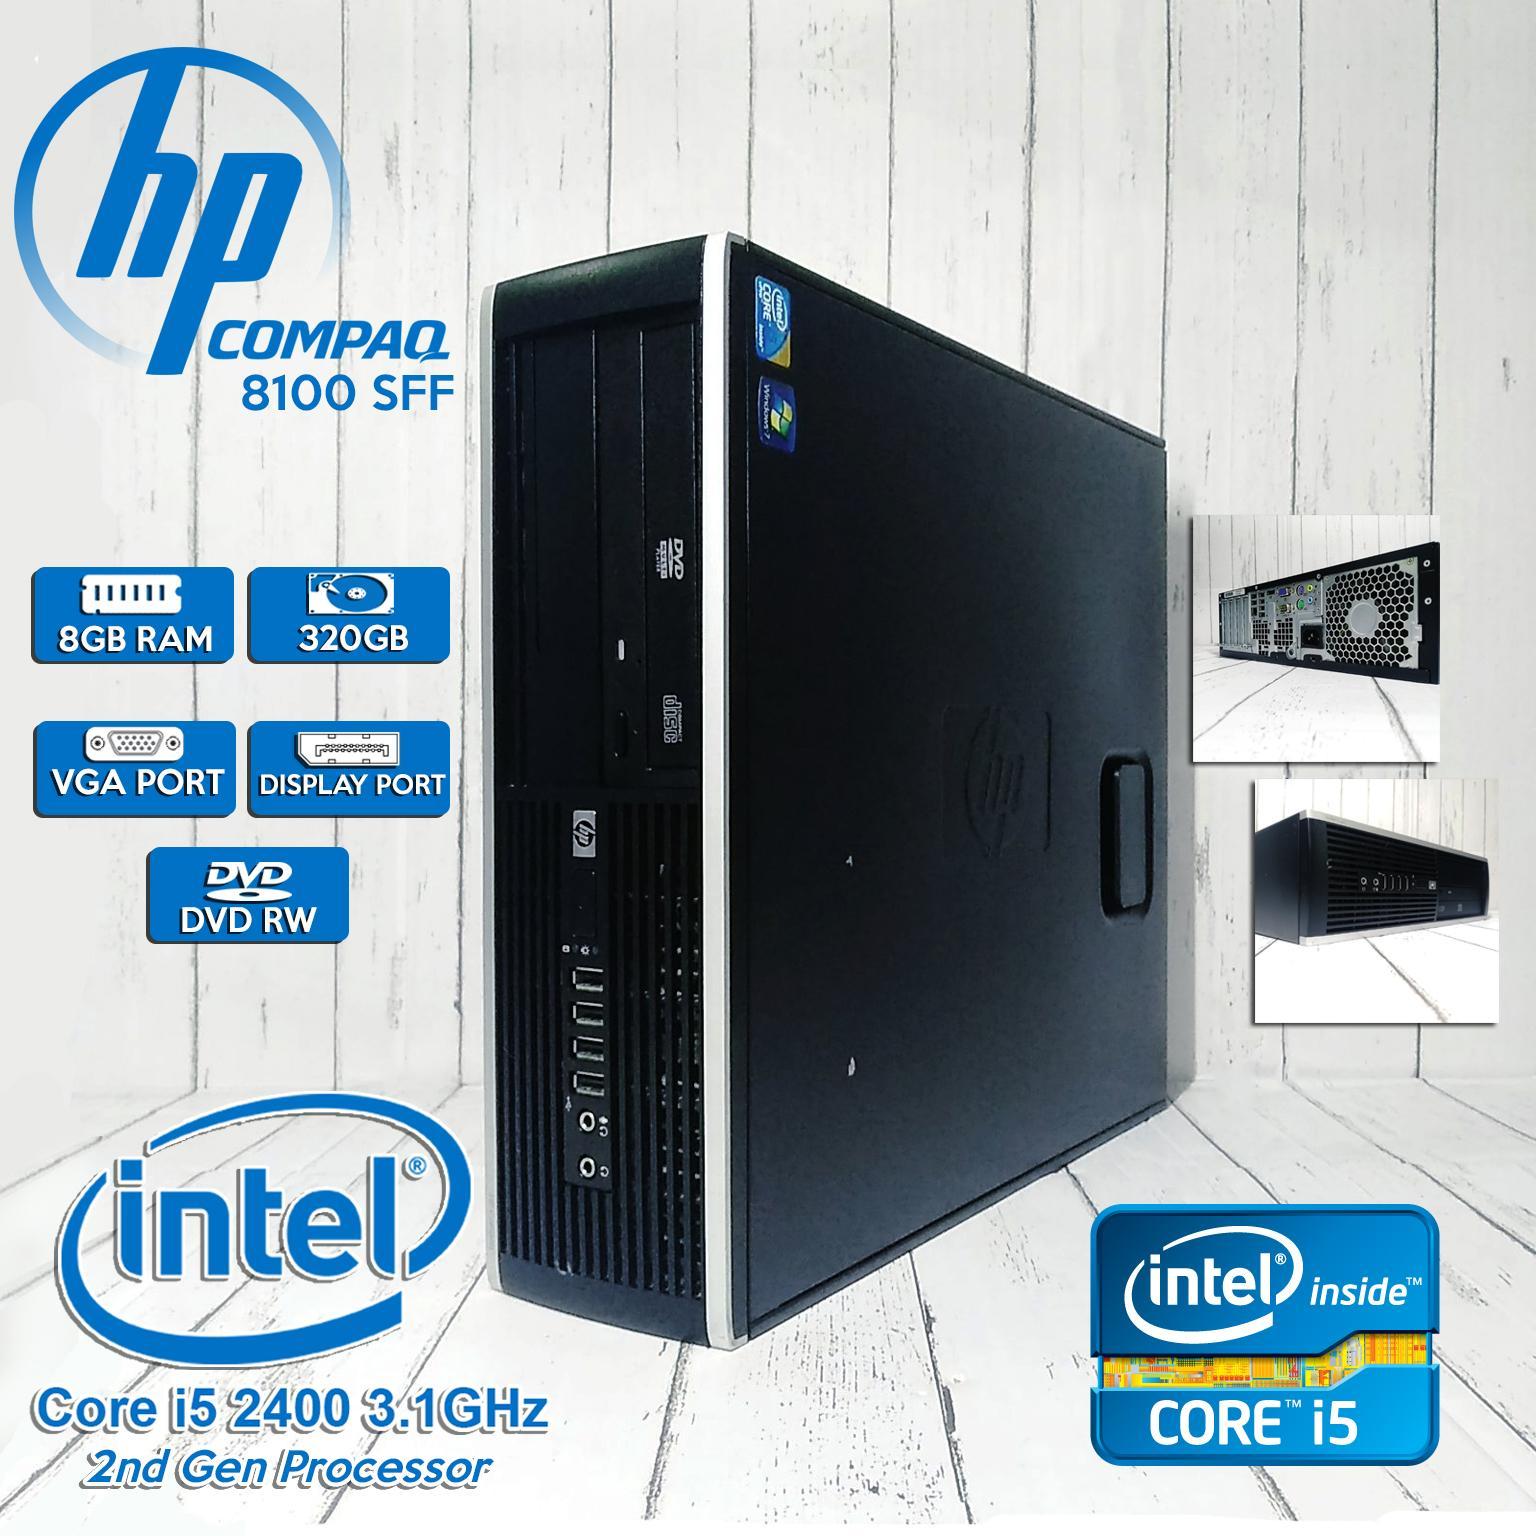 [CPU] HP Desktop i5-2400 3 1Ghz (2nd Gen) 8GB 320GB